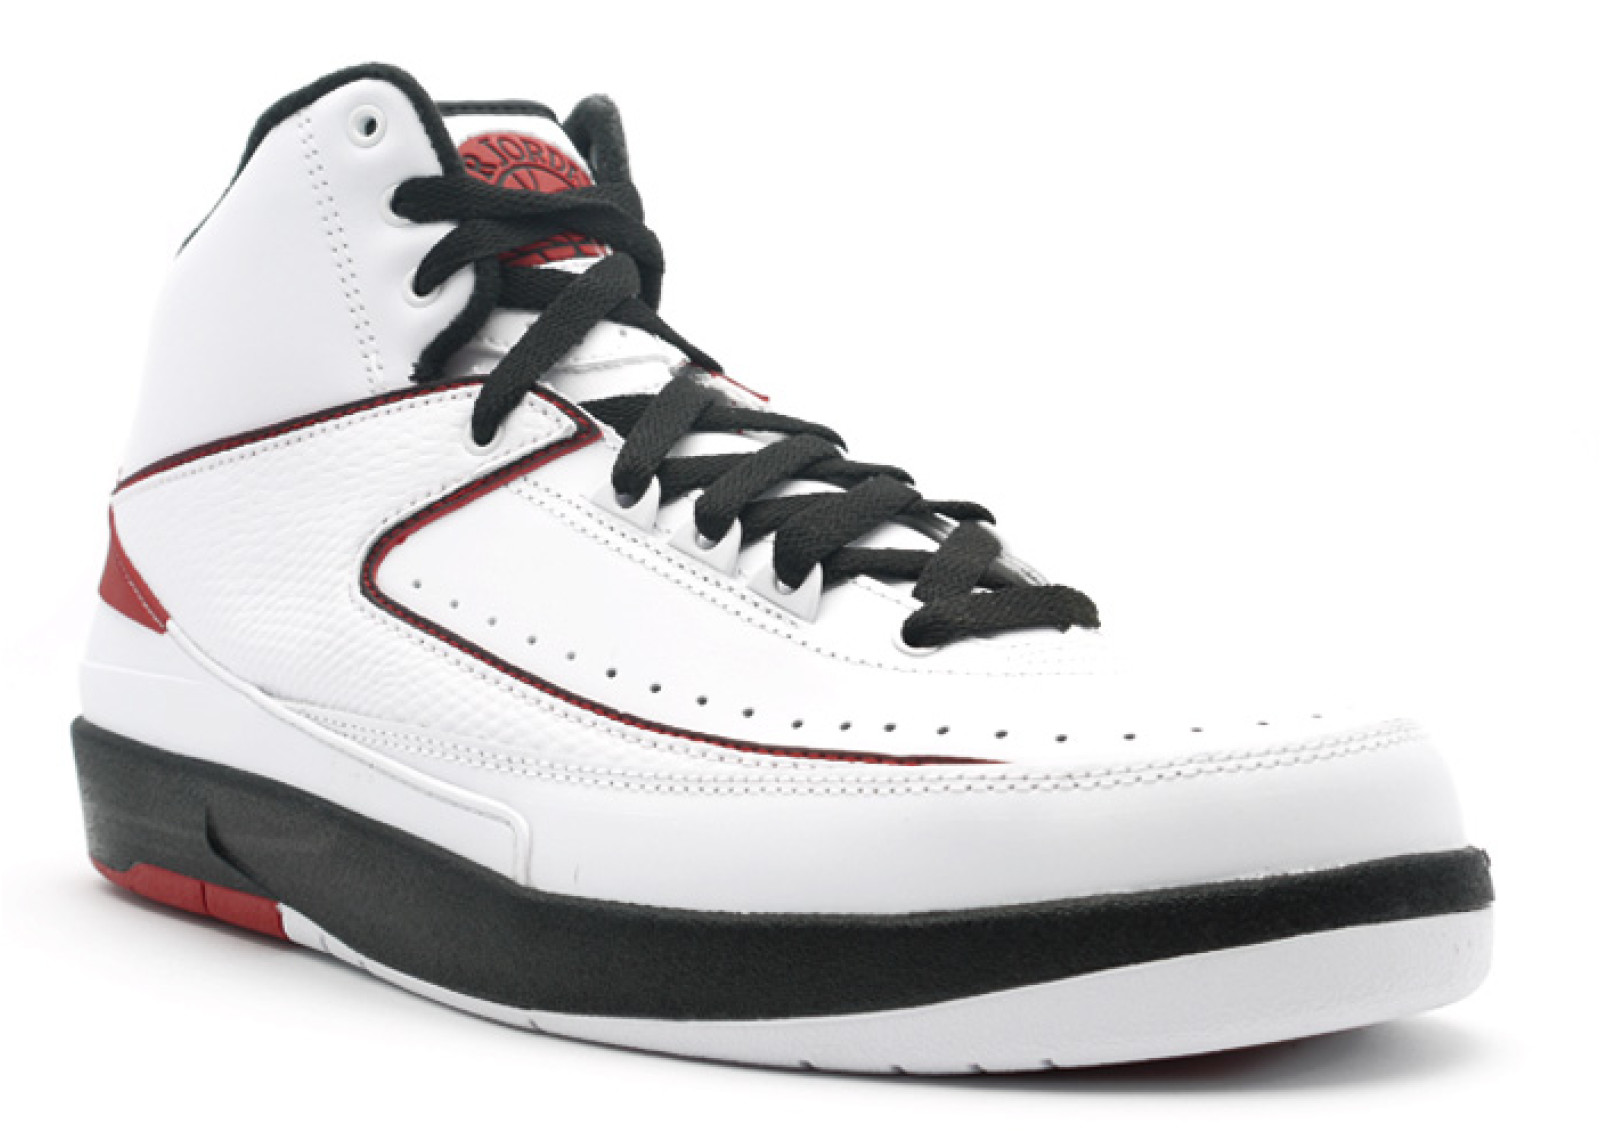 buy popular f007f 25ba7 Air Jordan - Men - Air Jordan 2 Retro Qf  2010 Release  - 395709-101 - Size  11